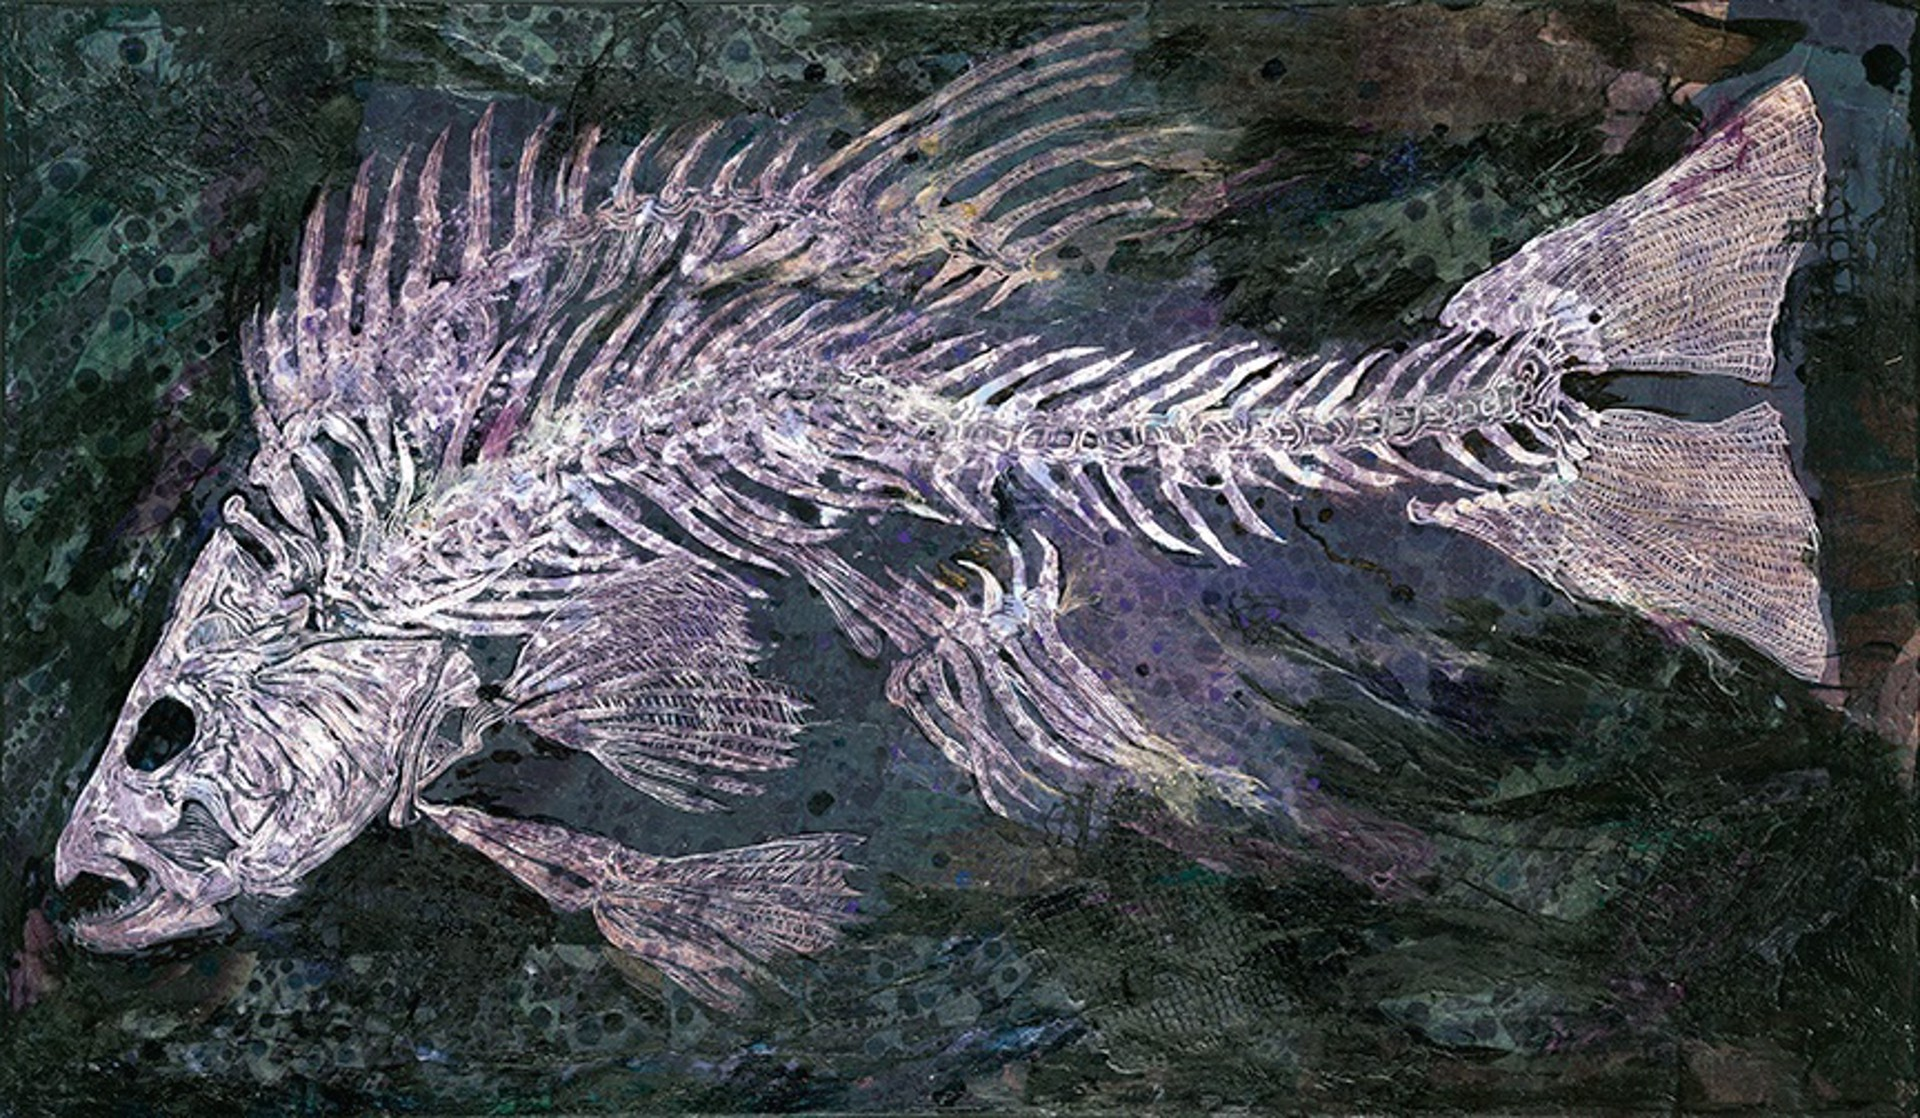 Coelencath by Rosemary Feit Covey